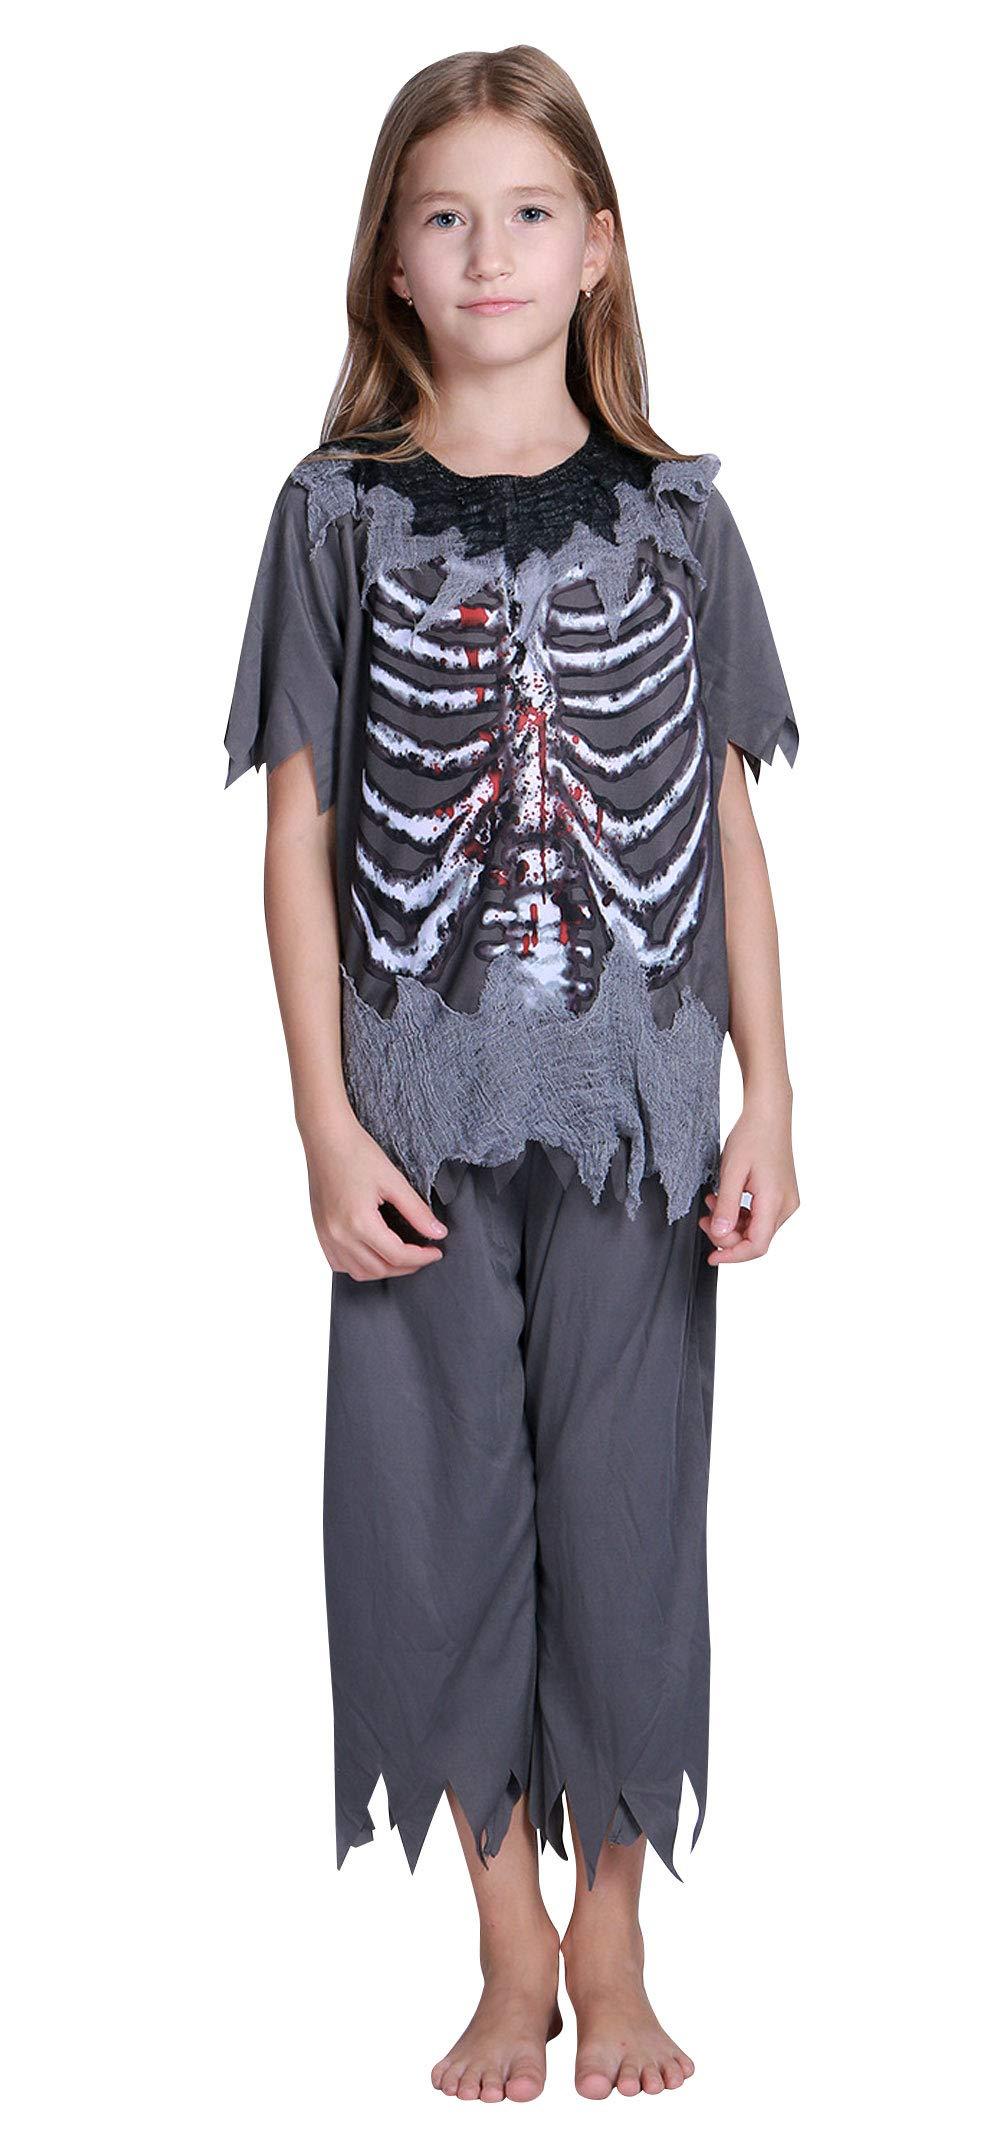 Kids 2 Pieces Bones Halloween Costume Boys Girls Skeleton Ghost Outfits Pants Set M